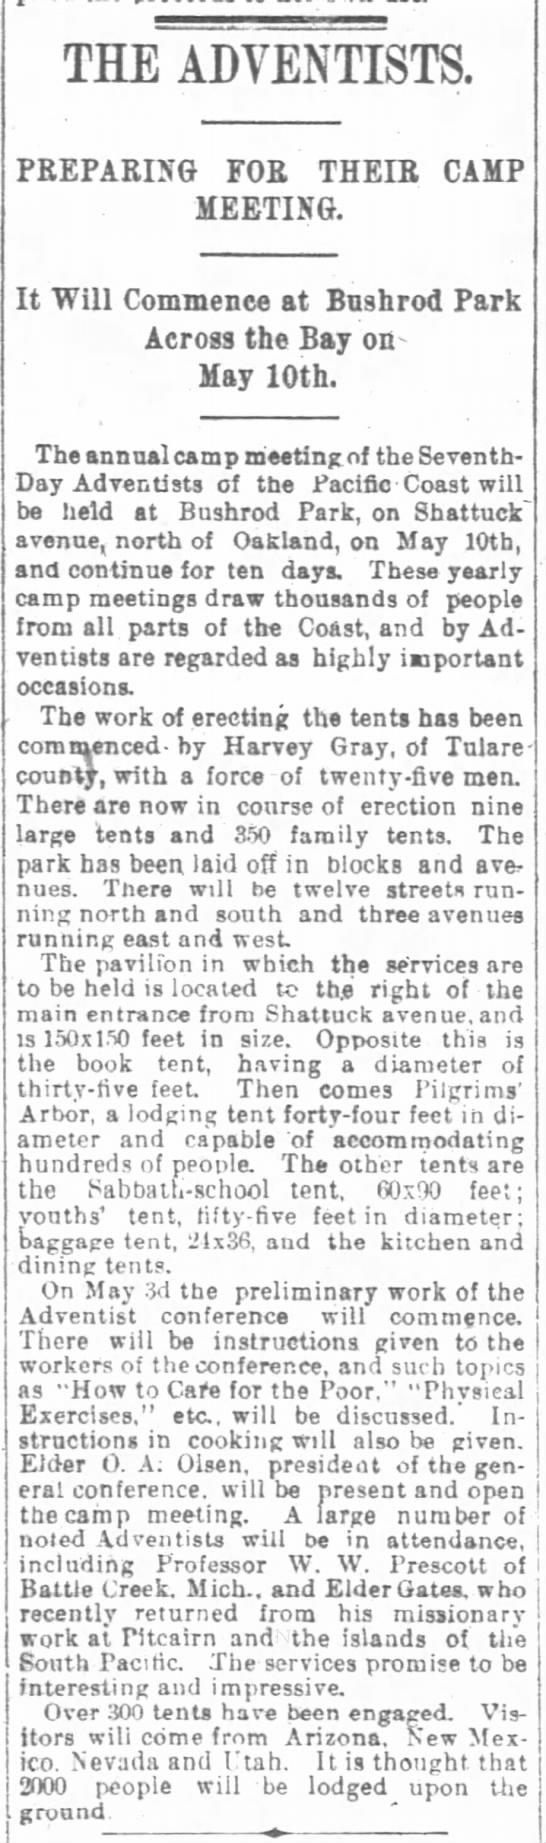 Camp meeting preparations, Oakland, CA, 1894 -